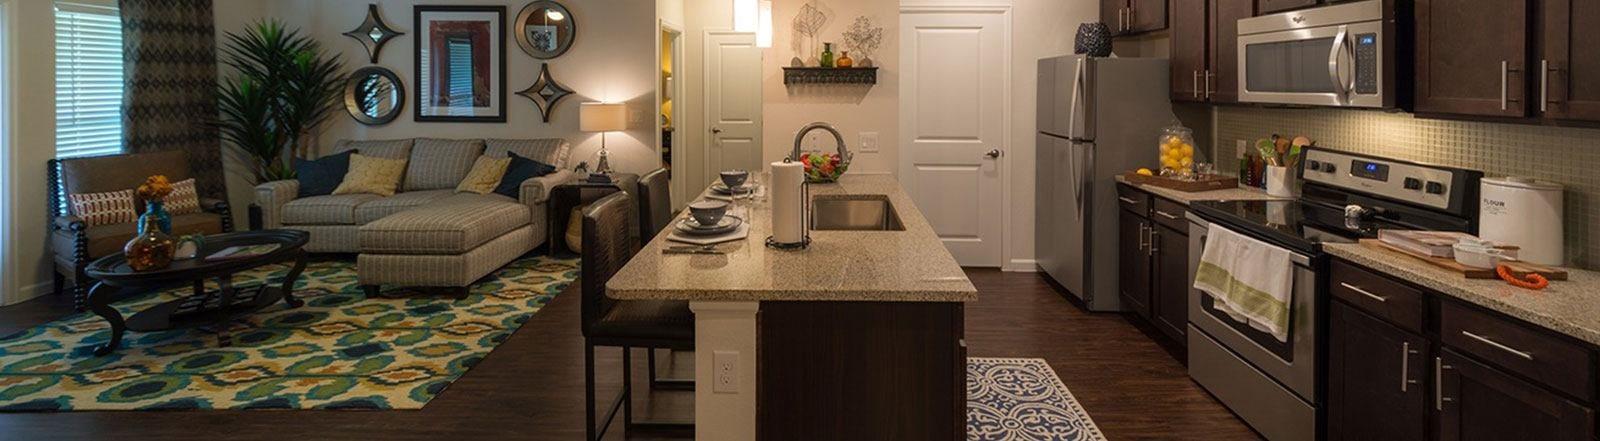 Kitchen Interior at Allora Bella Terra, Richmond, 77406